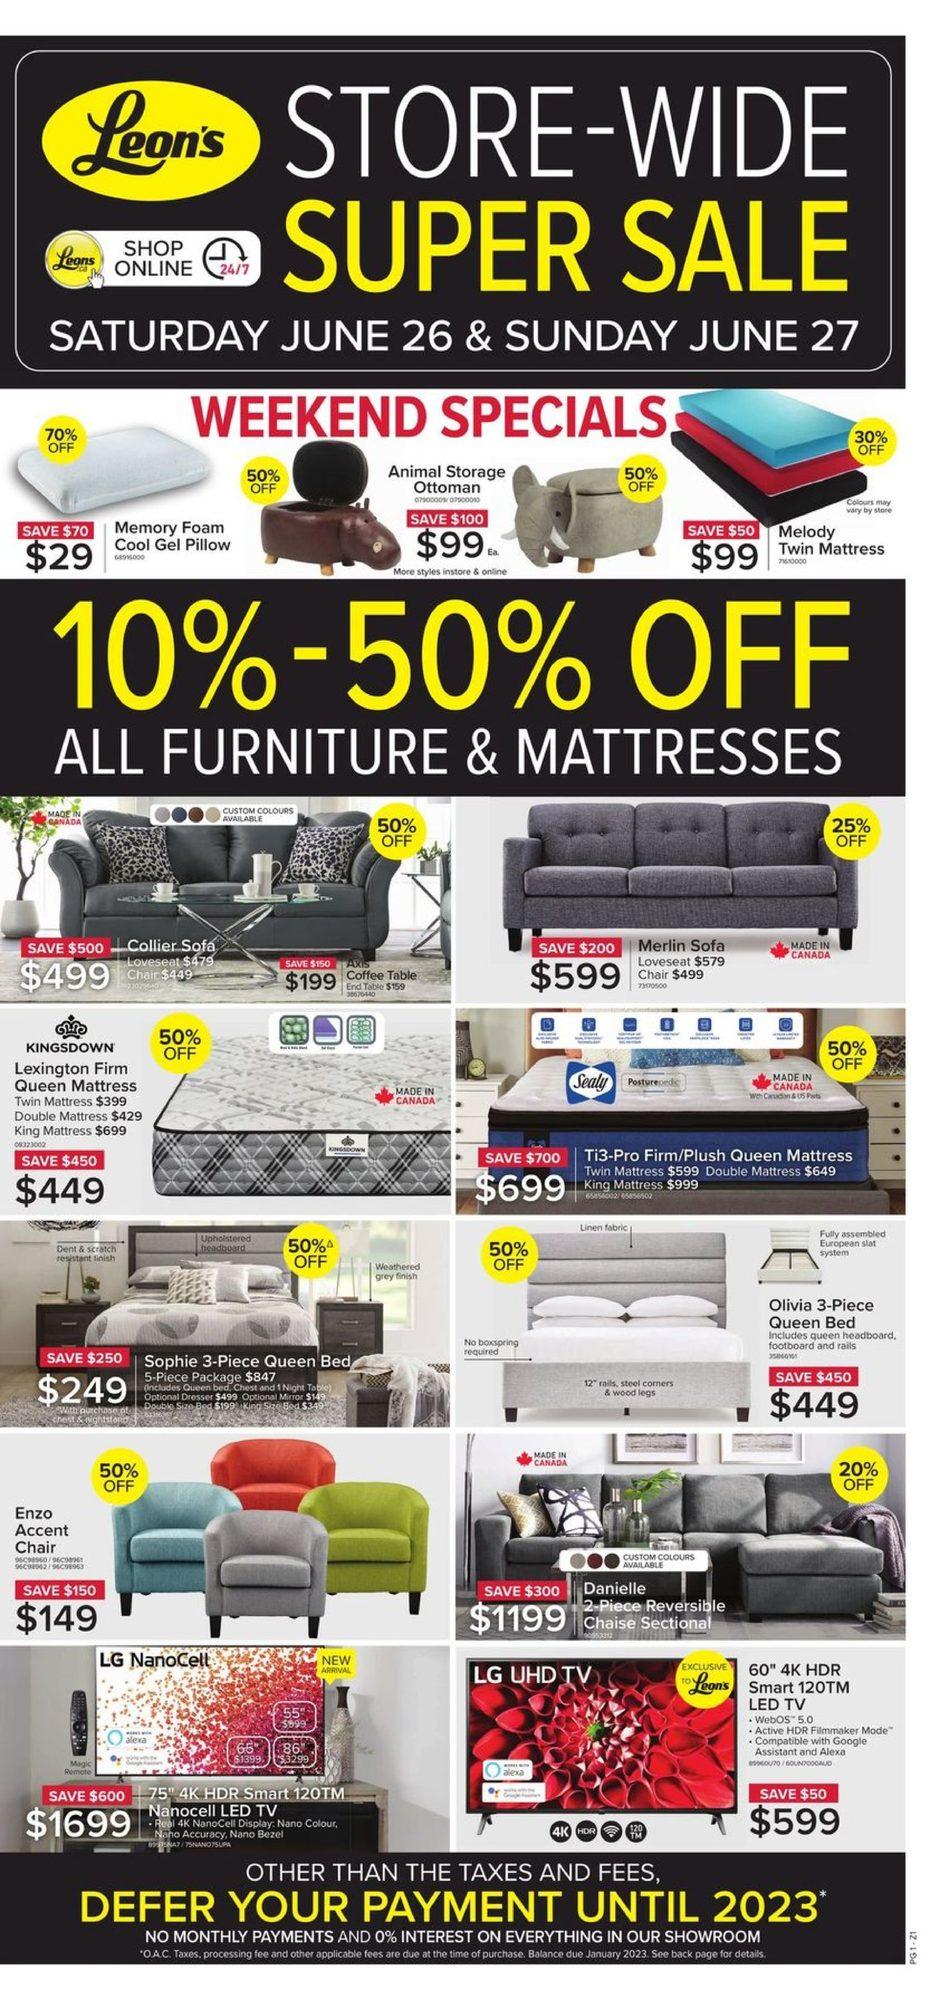 Leon's - Store-Wide Super Sale - Weekly Flyer Specials